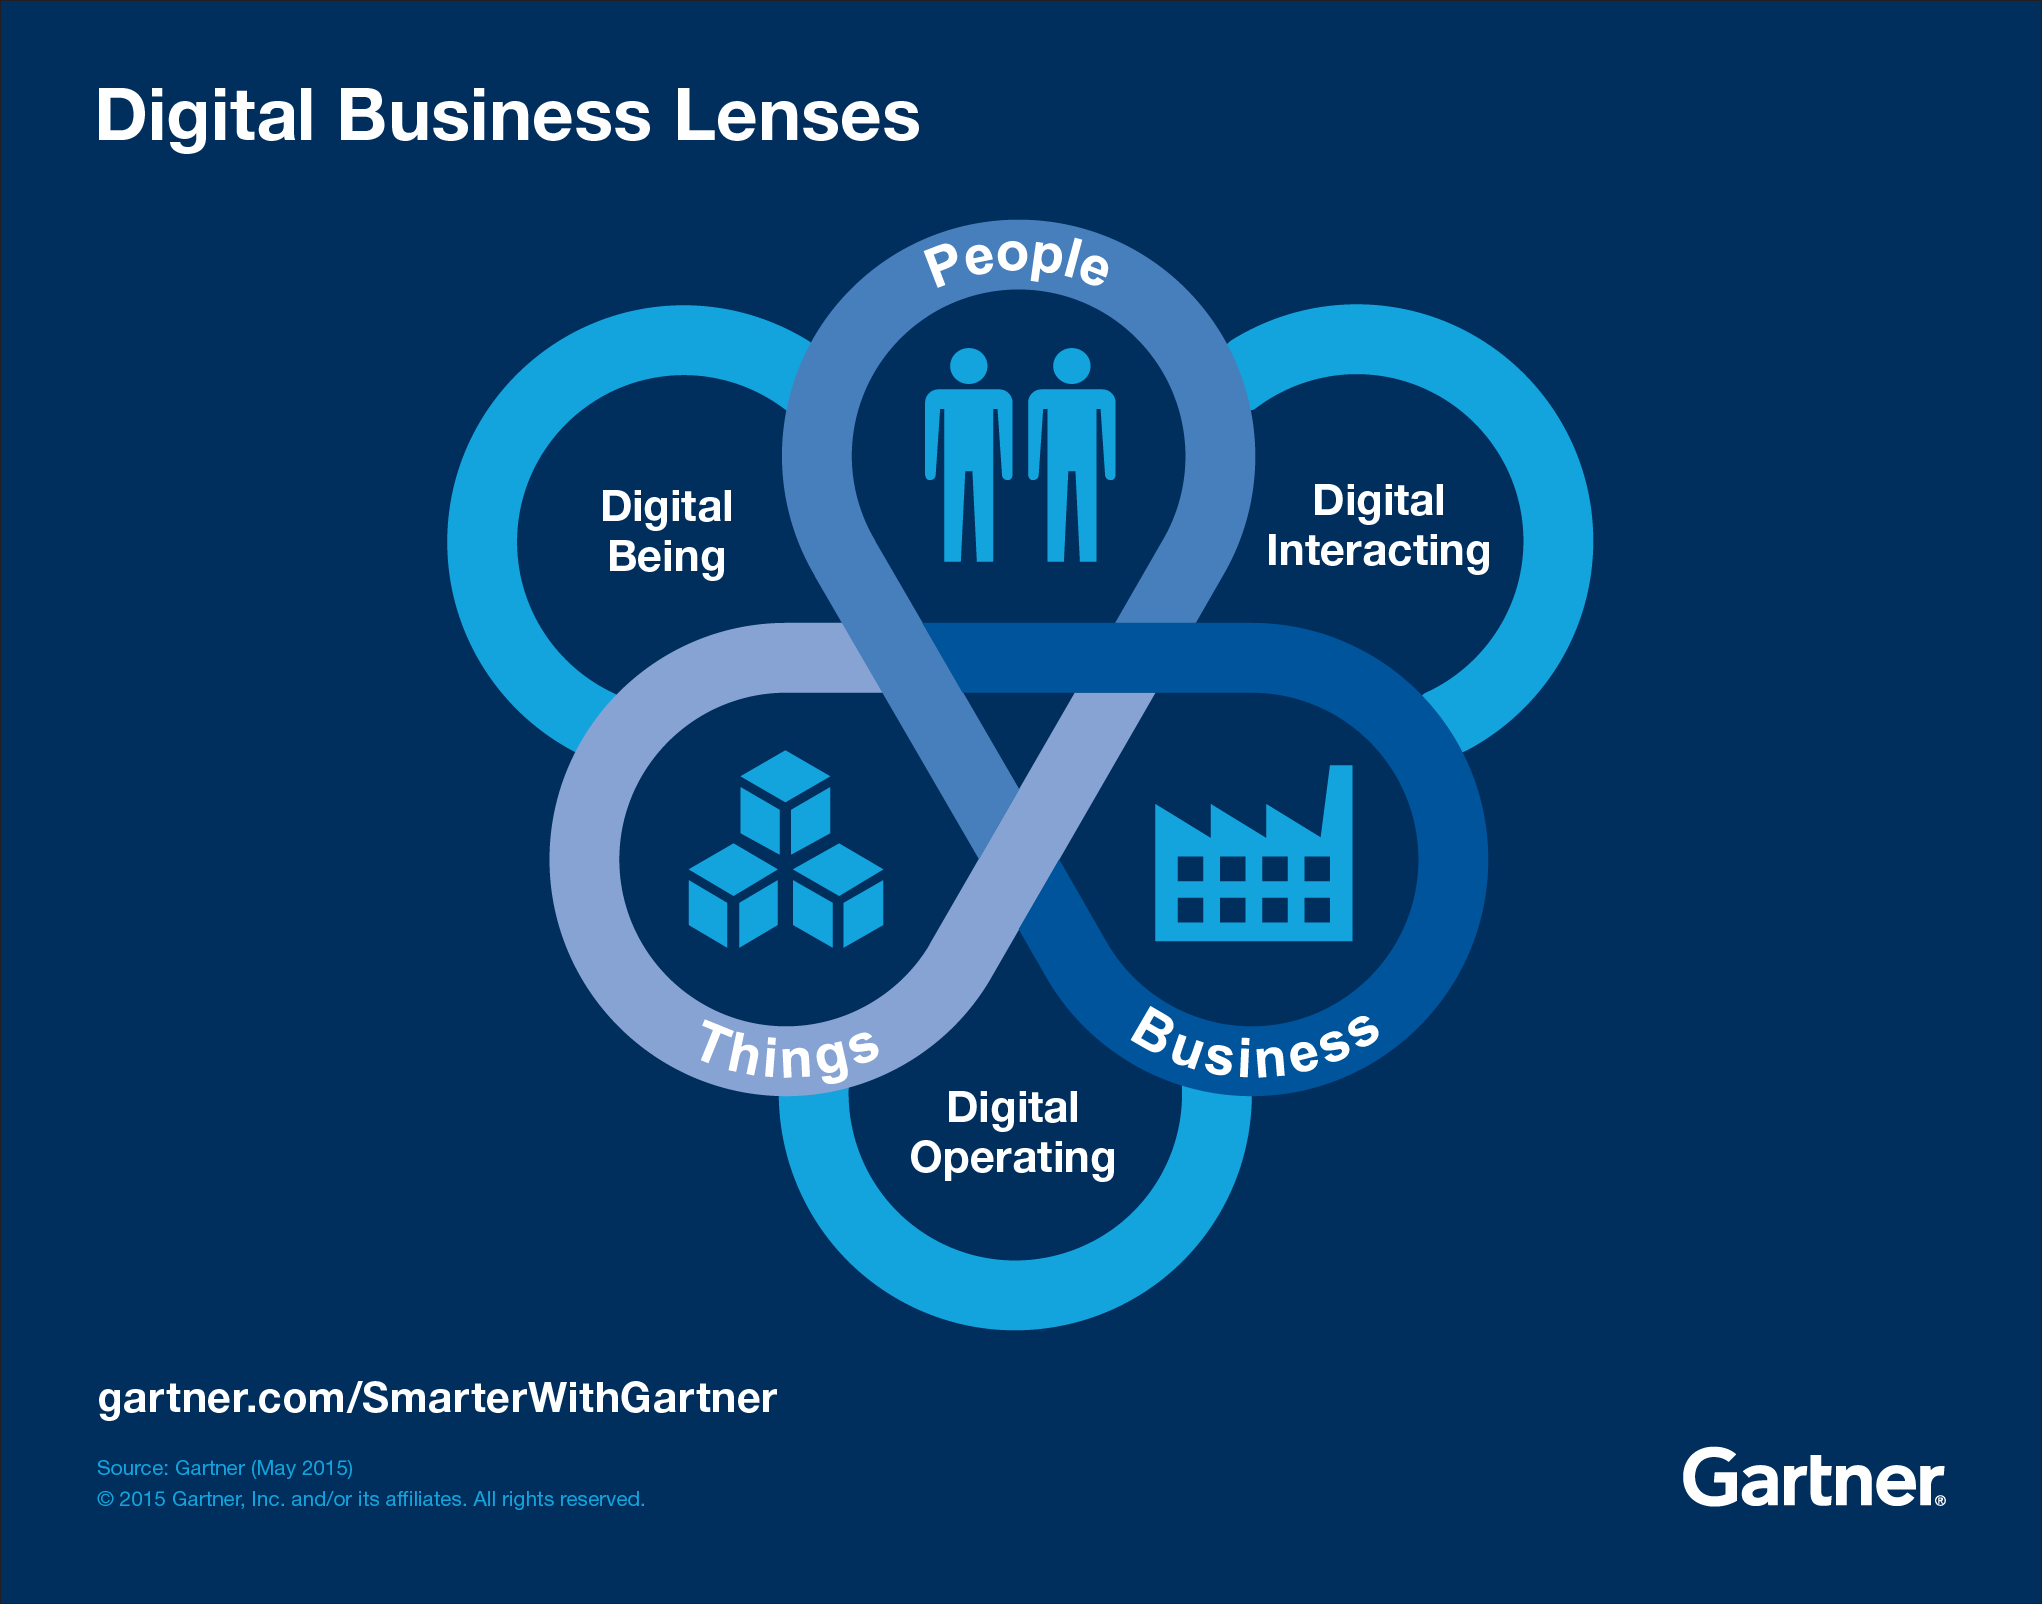 Digital Business Lens